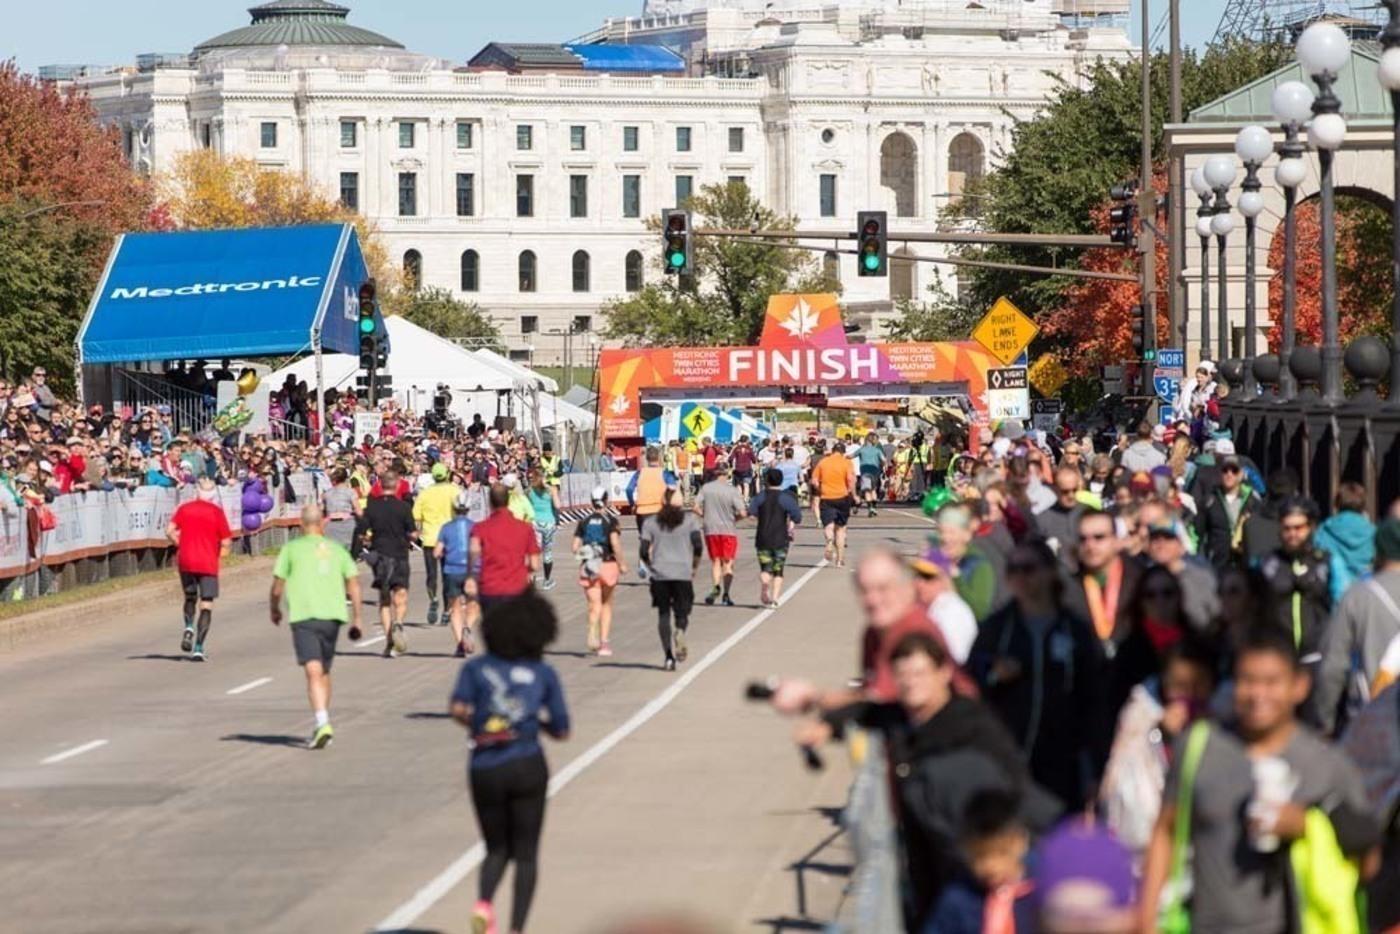 Medtronics Twin Cities Marathon